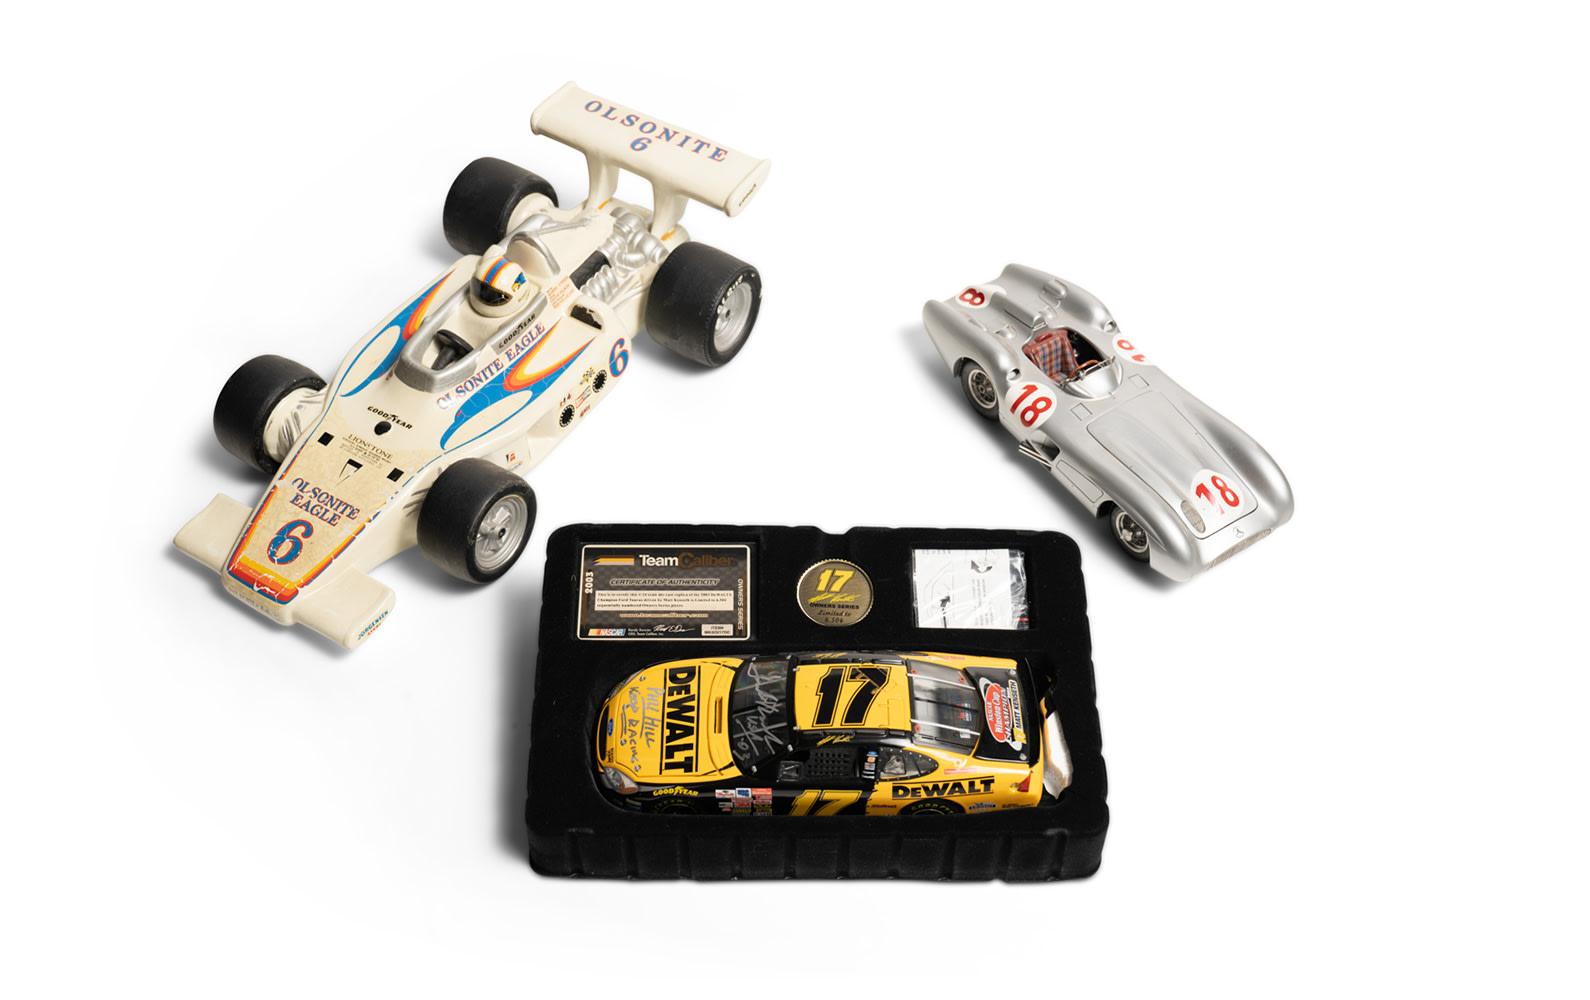 Team Caliber Signed NASCAR Model, Ceramic Olsonite Eagle Race Car, and Mercedes-Benz W196 Scale Model